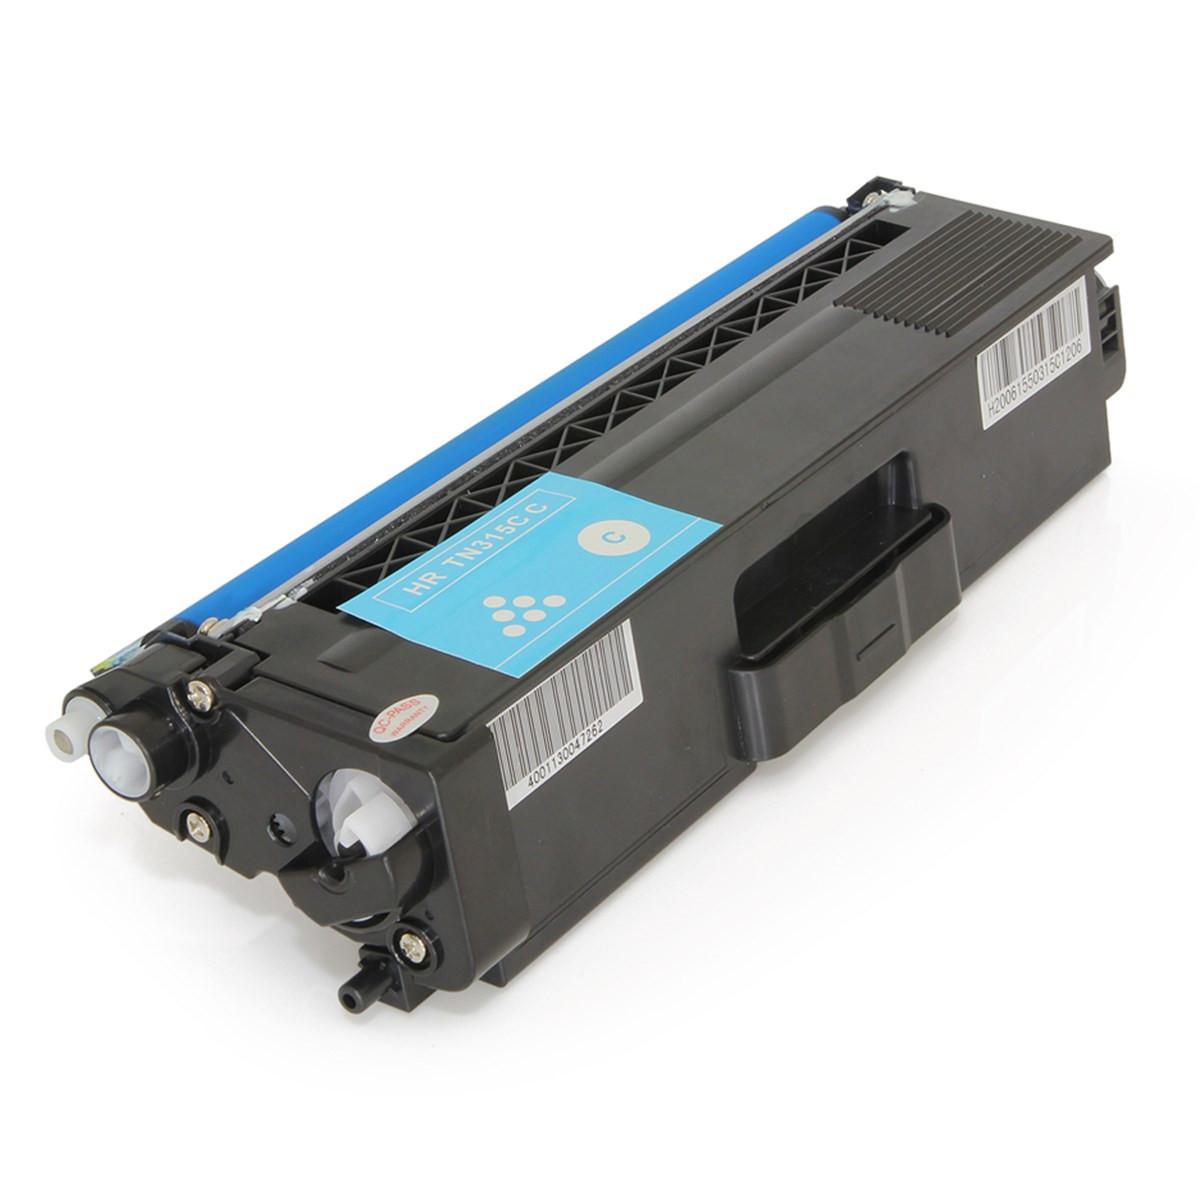 Toner Compatível com Brother TN310 TN310C Ciano | HL4150CDN HL4570CDW MFC9460CDN | Chinamate 3.5k